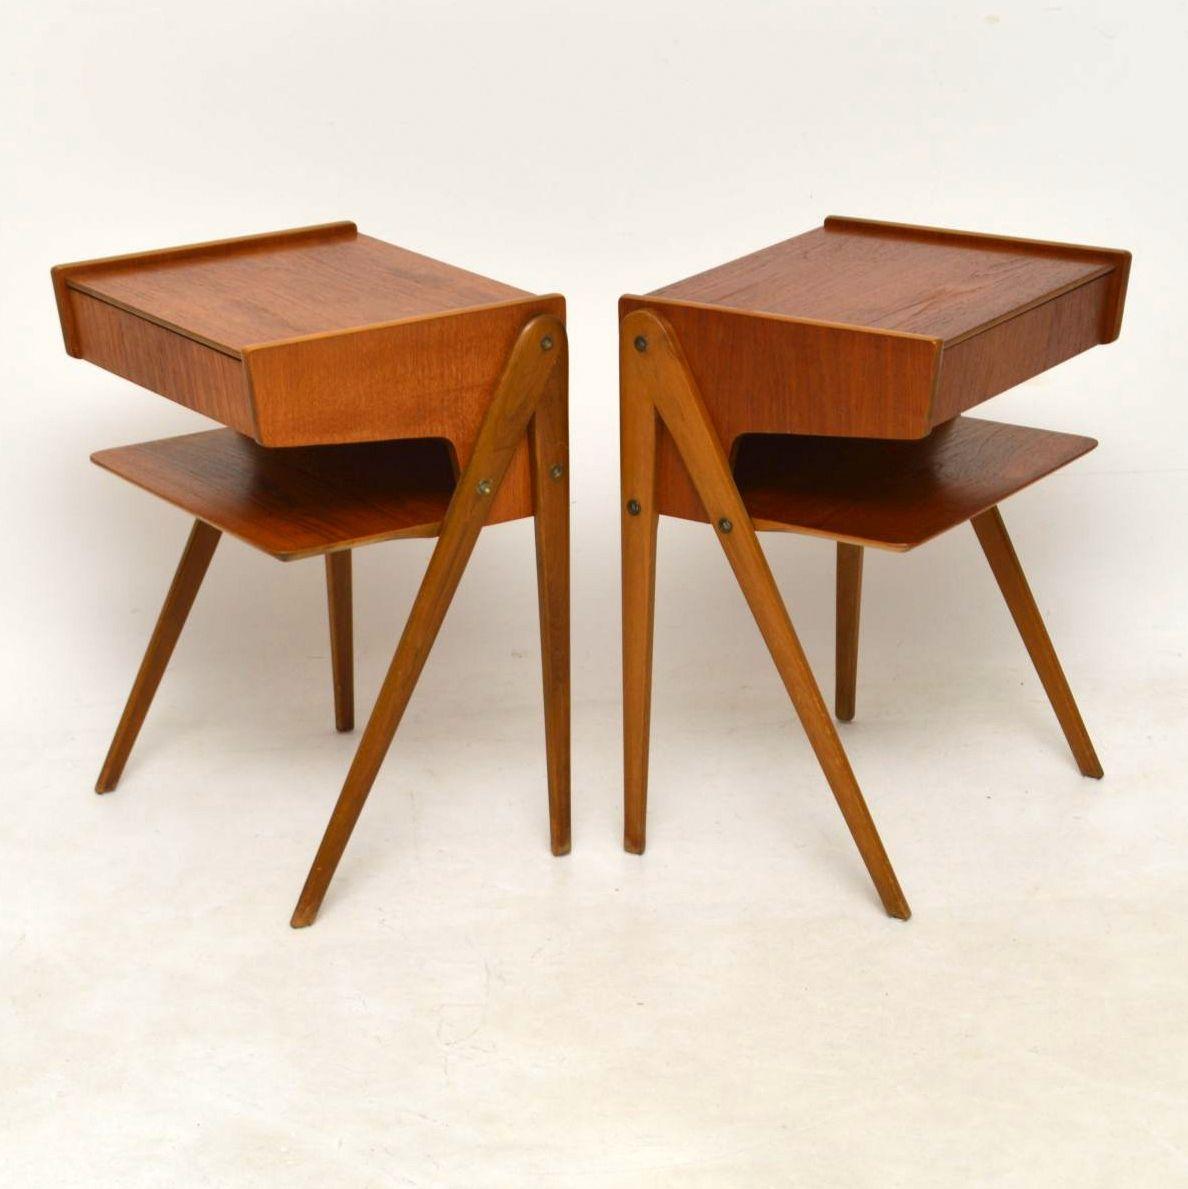 1960 S Pair Of Swedish Vintage Teak Bedside Tables